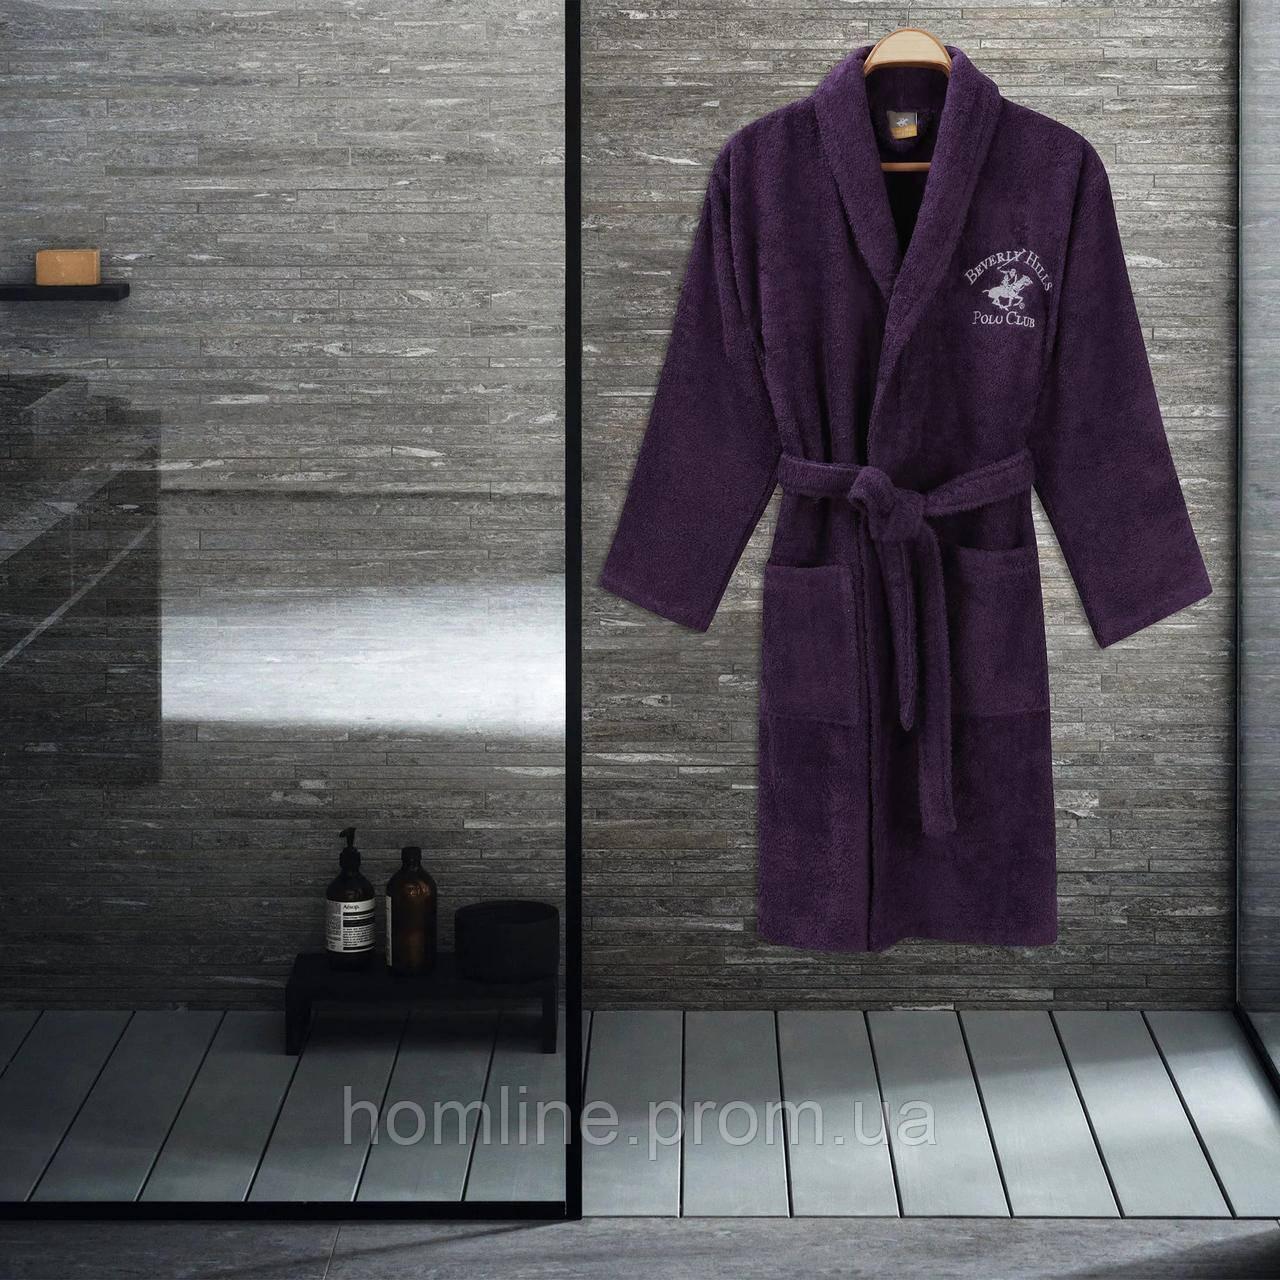 Халат Beverly Hills Polo Club S/M purple сиреневый 355BHP1710